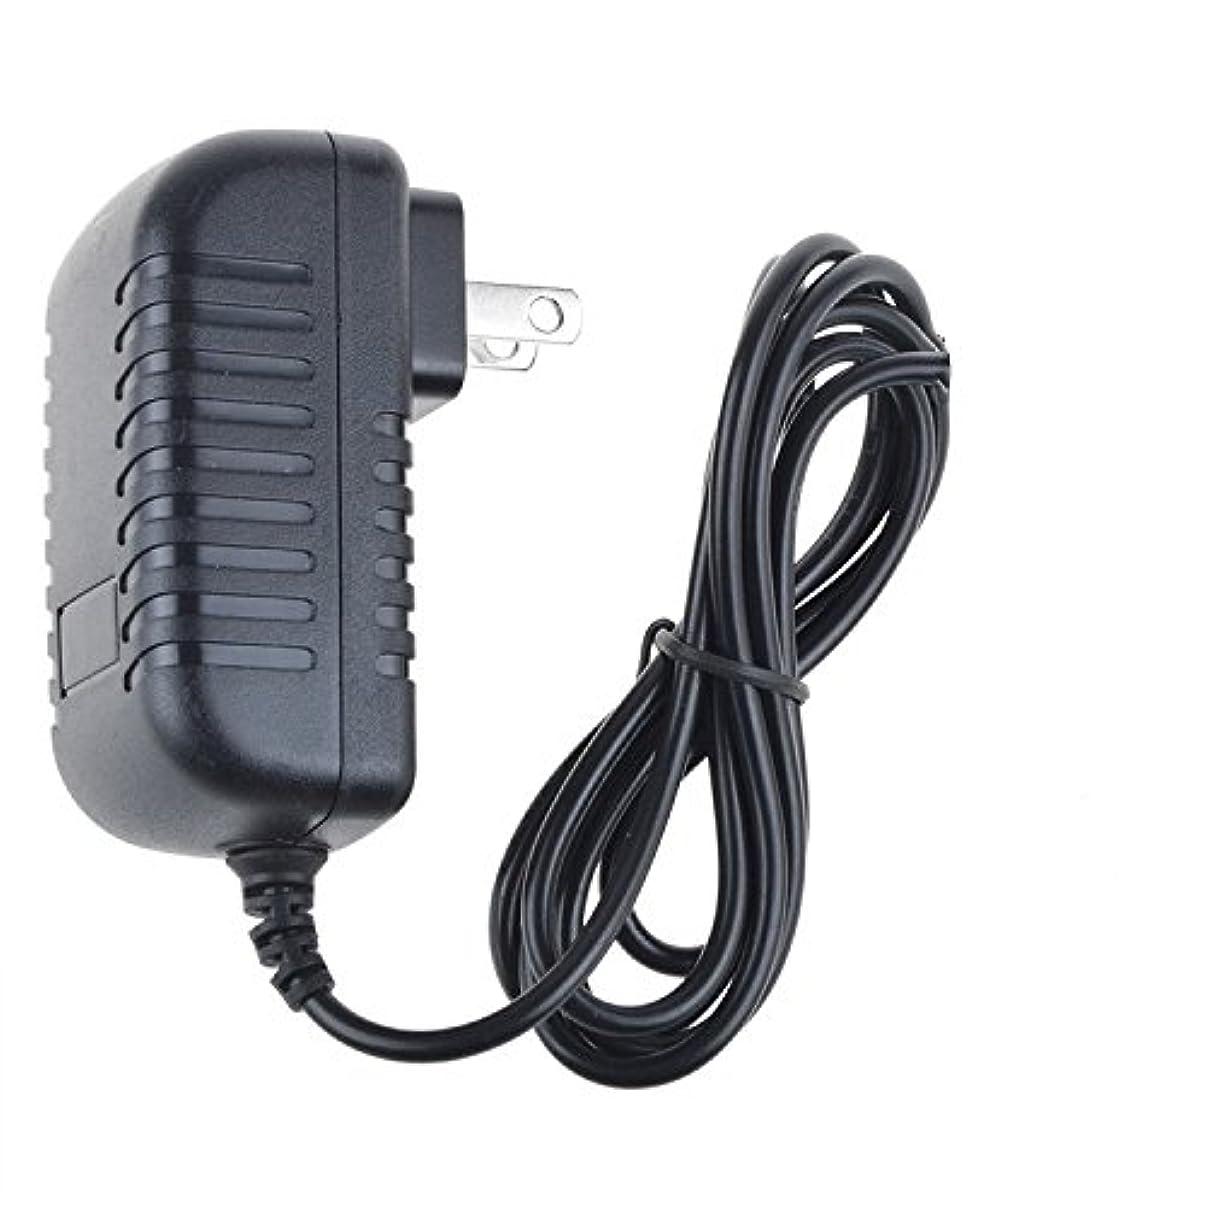 SLLEA AC/DC Adapter for CenturyLink ZyXEL PK5001Z PK5001PK Modem Router Power Supply PSU